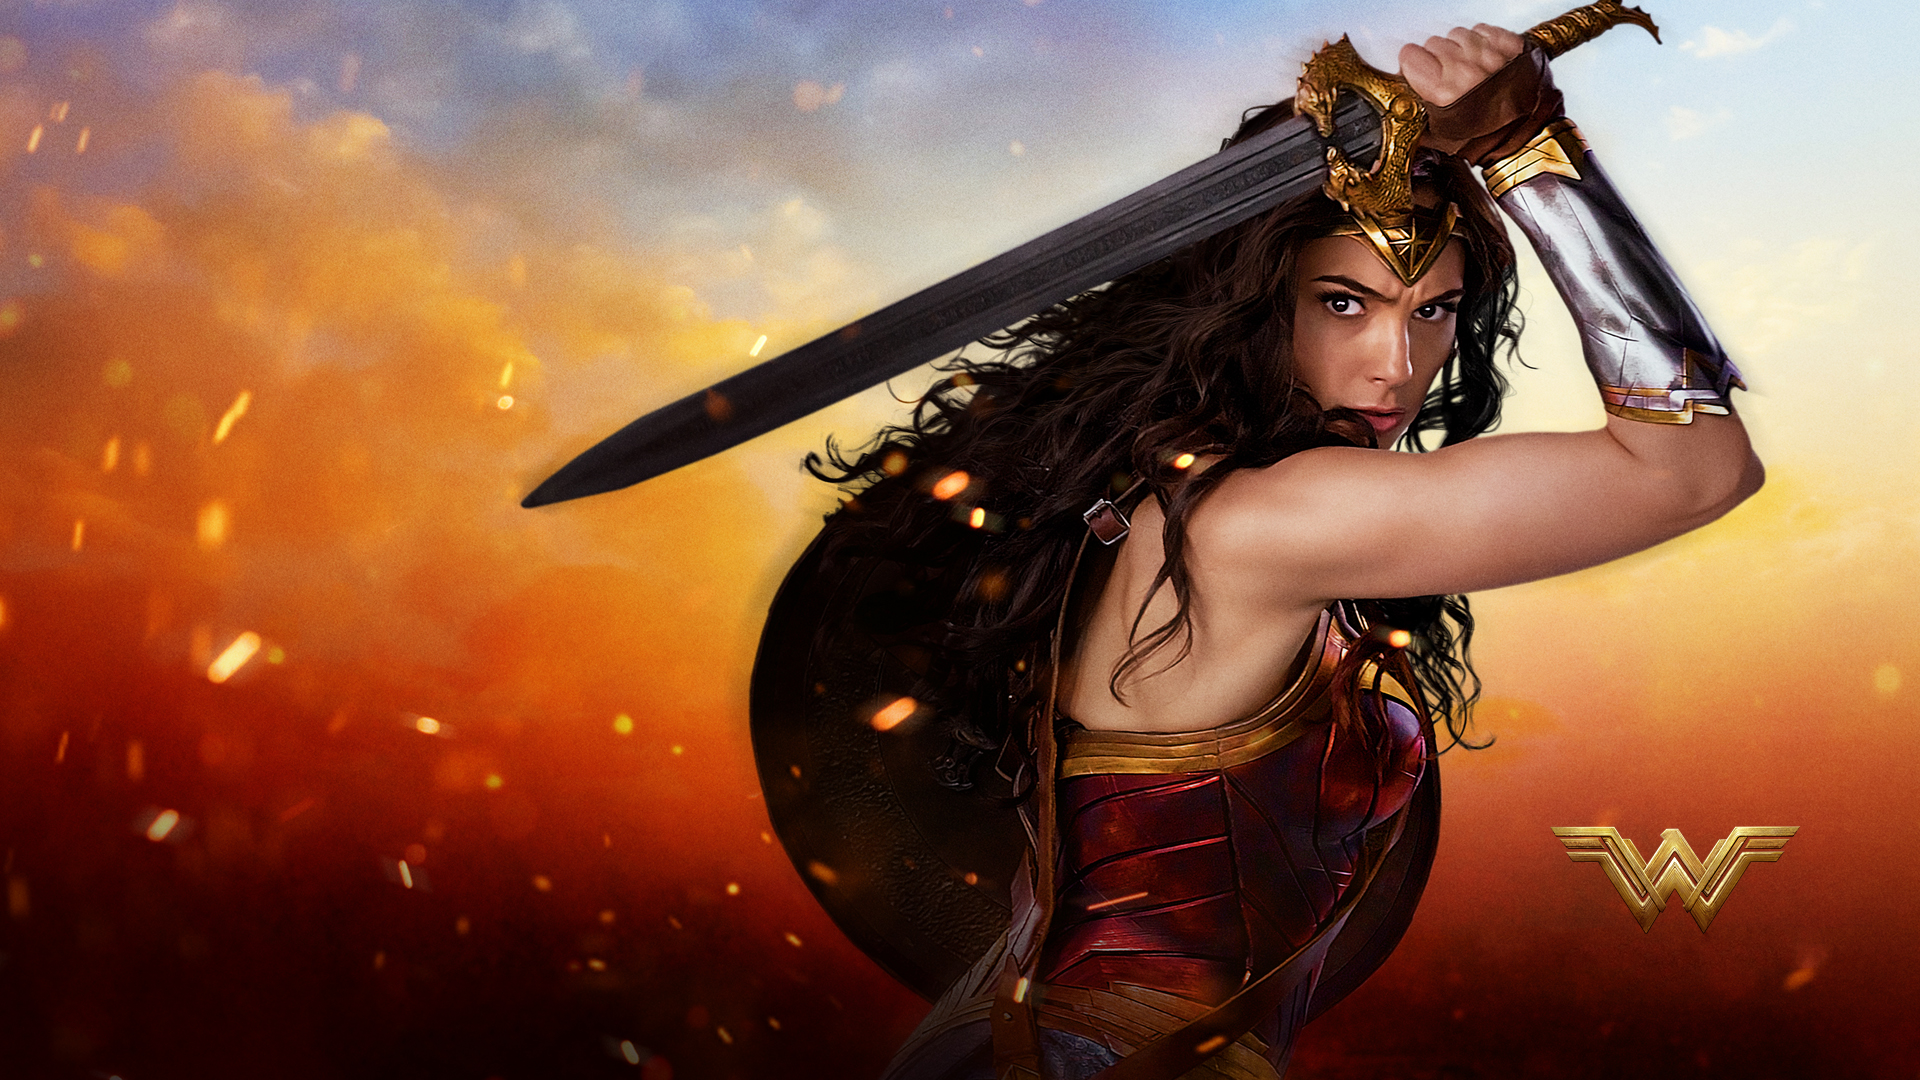 Wonder Woman Hd Wallpaper Background Image 1920x1080 Id